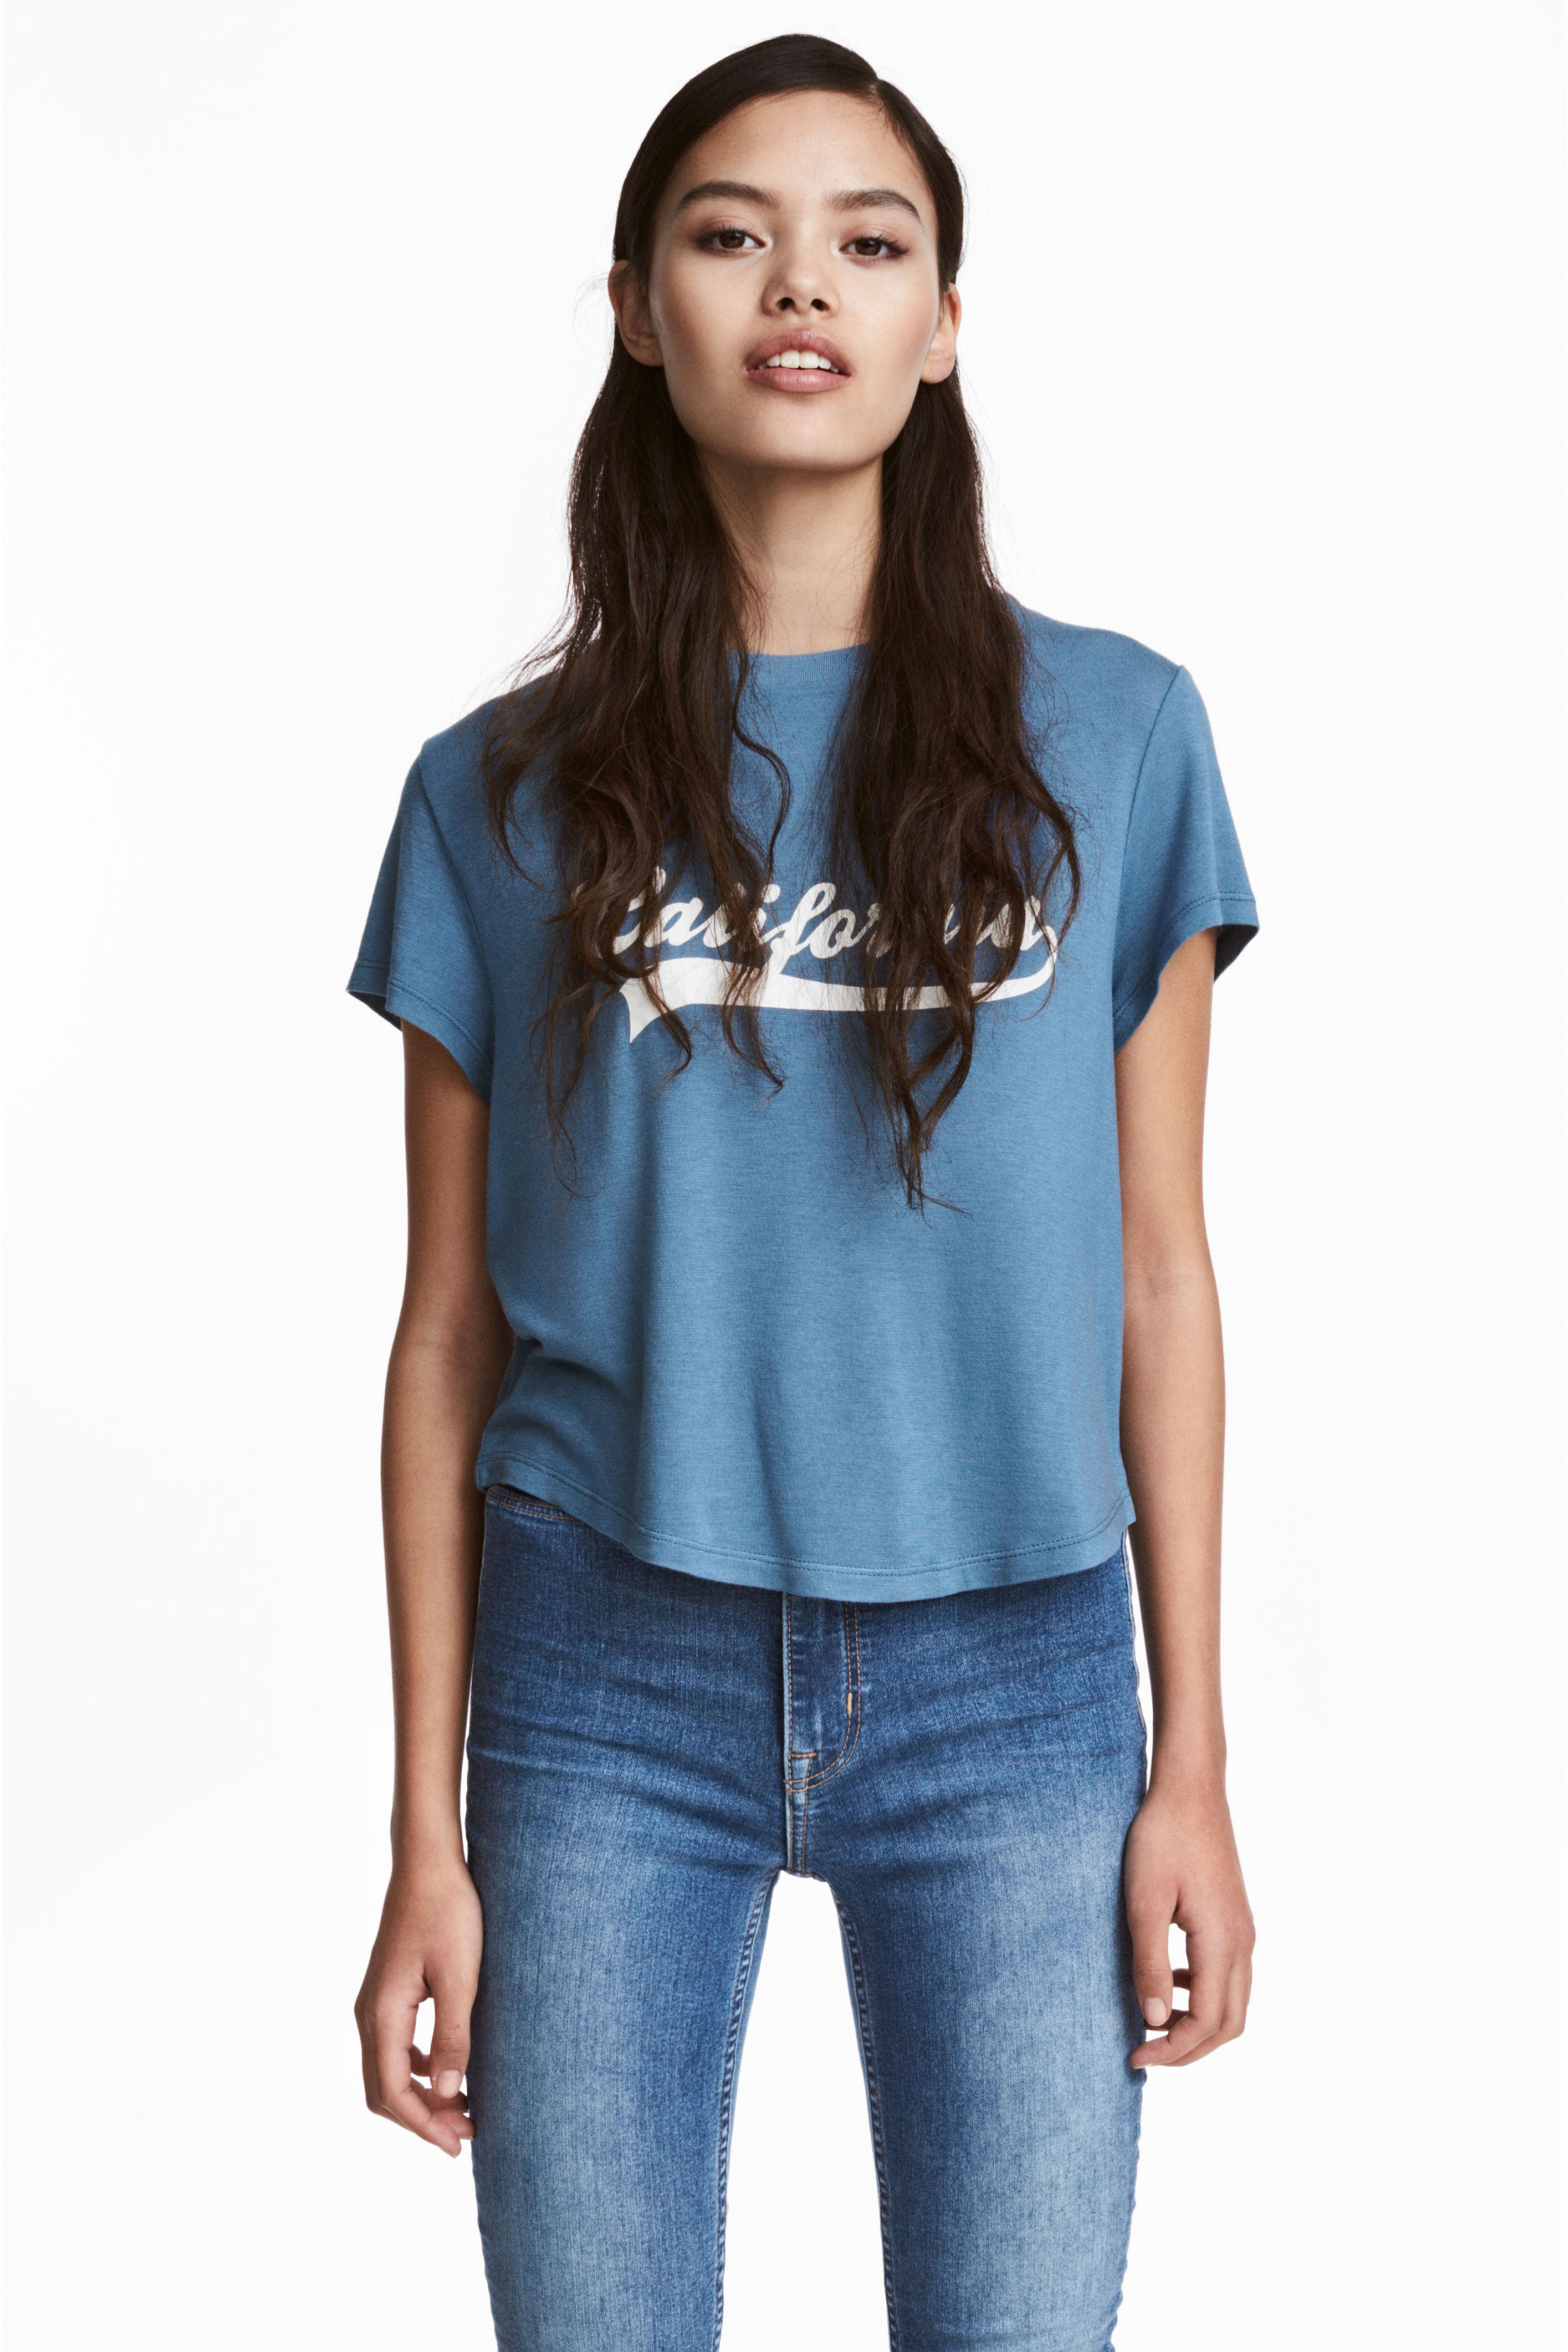 353a64388c Motívumos póló - Fehér/unikornis - NŐI | H&M HU